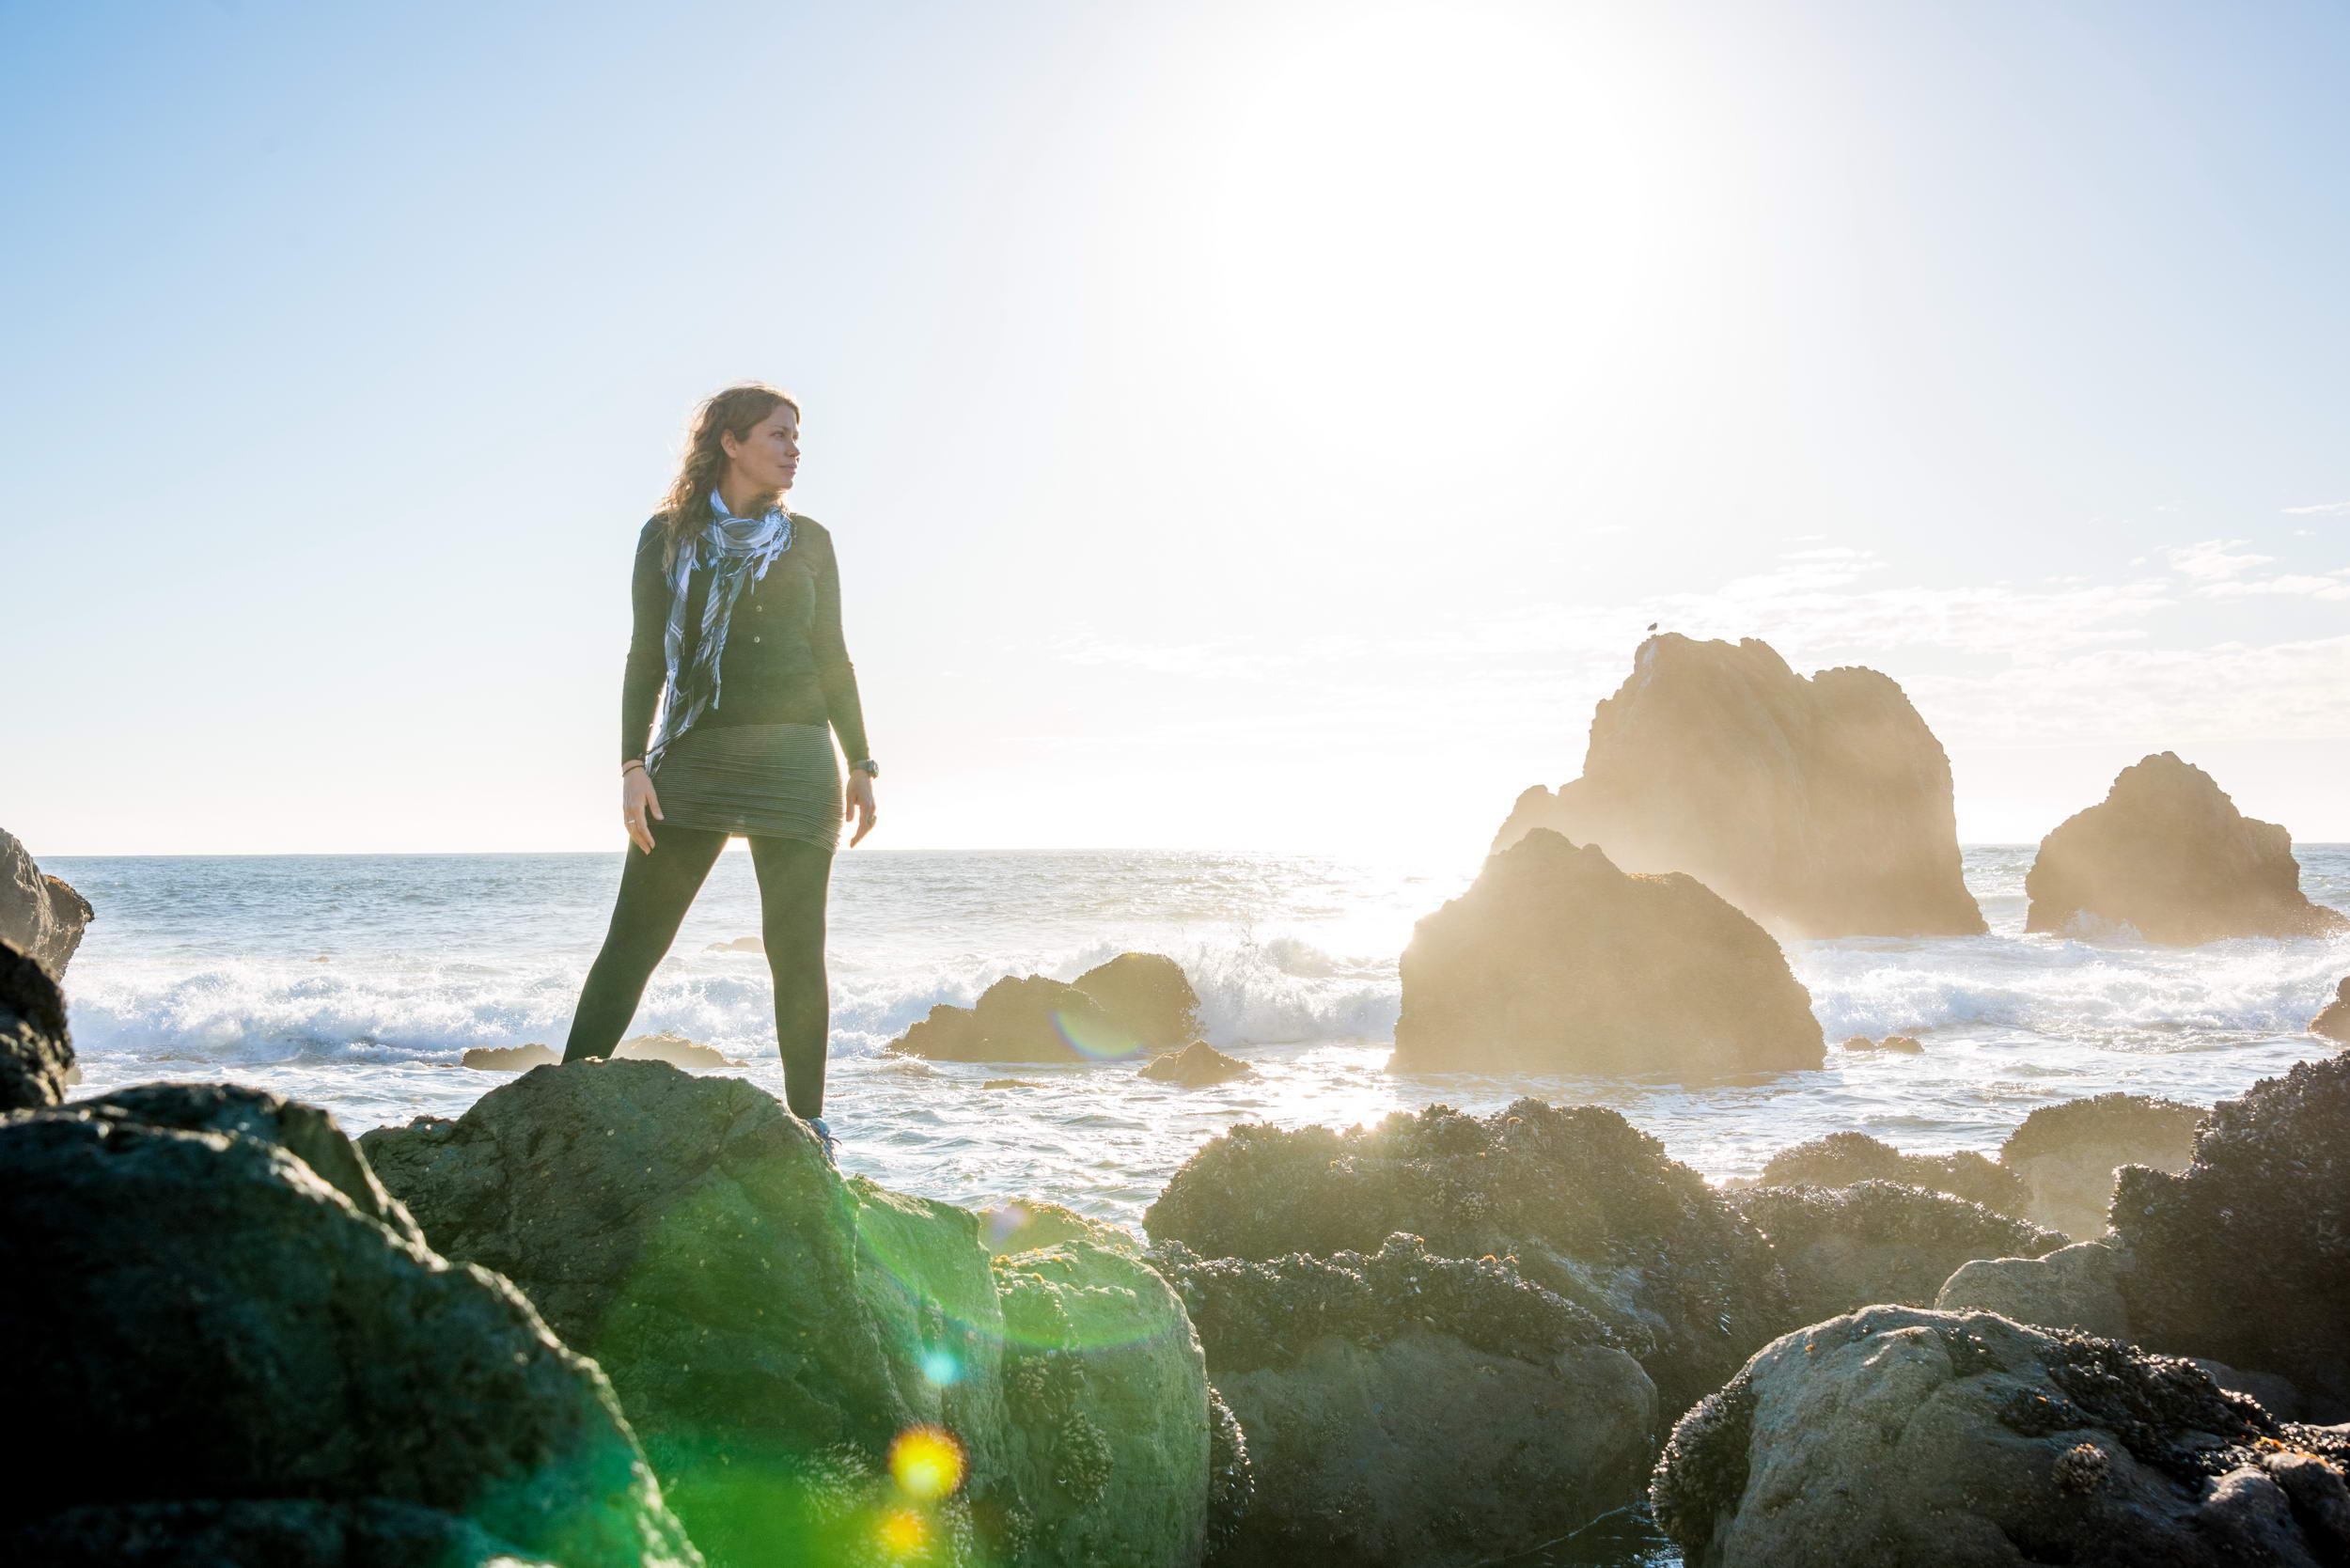 Caroline_Leon-Schoolhouse_Beach-California-Greg_Goodman-AdventuresofaGoodMan-01-29-15_17-25-07